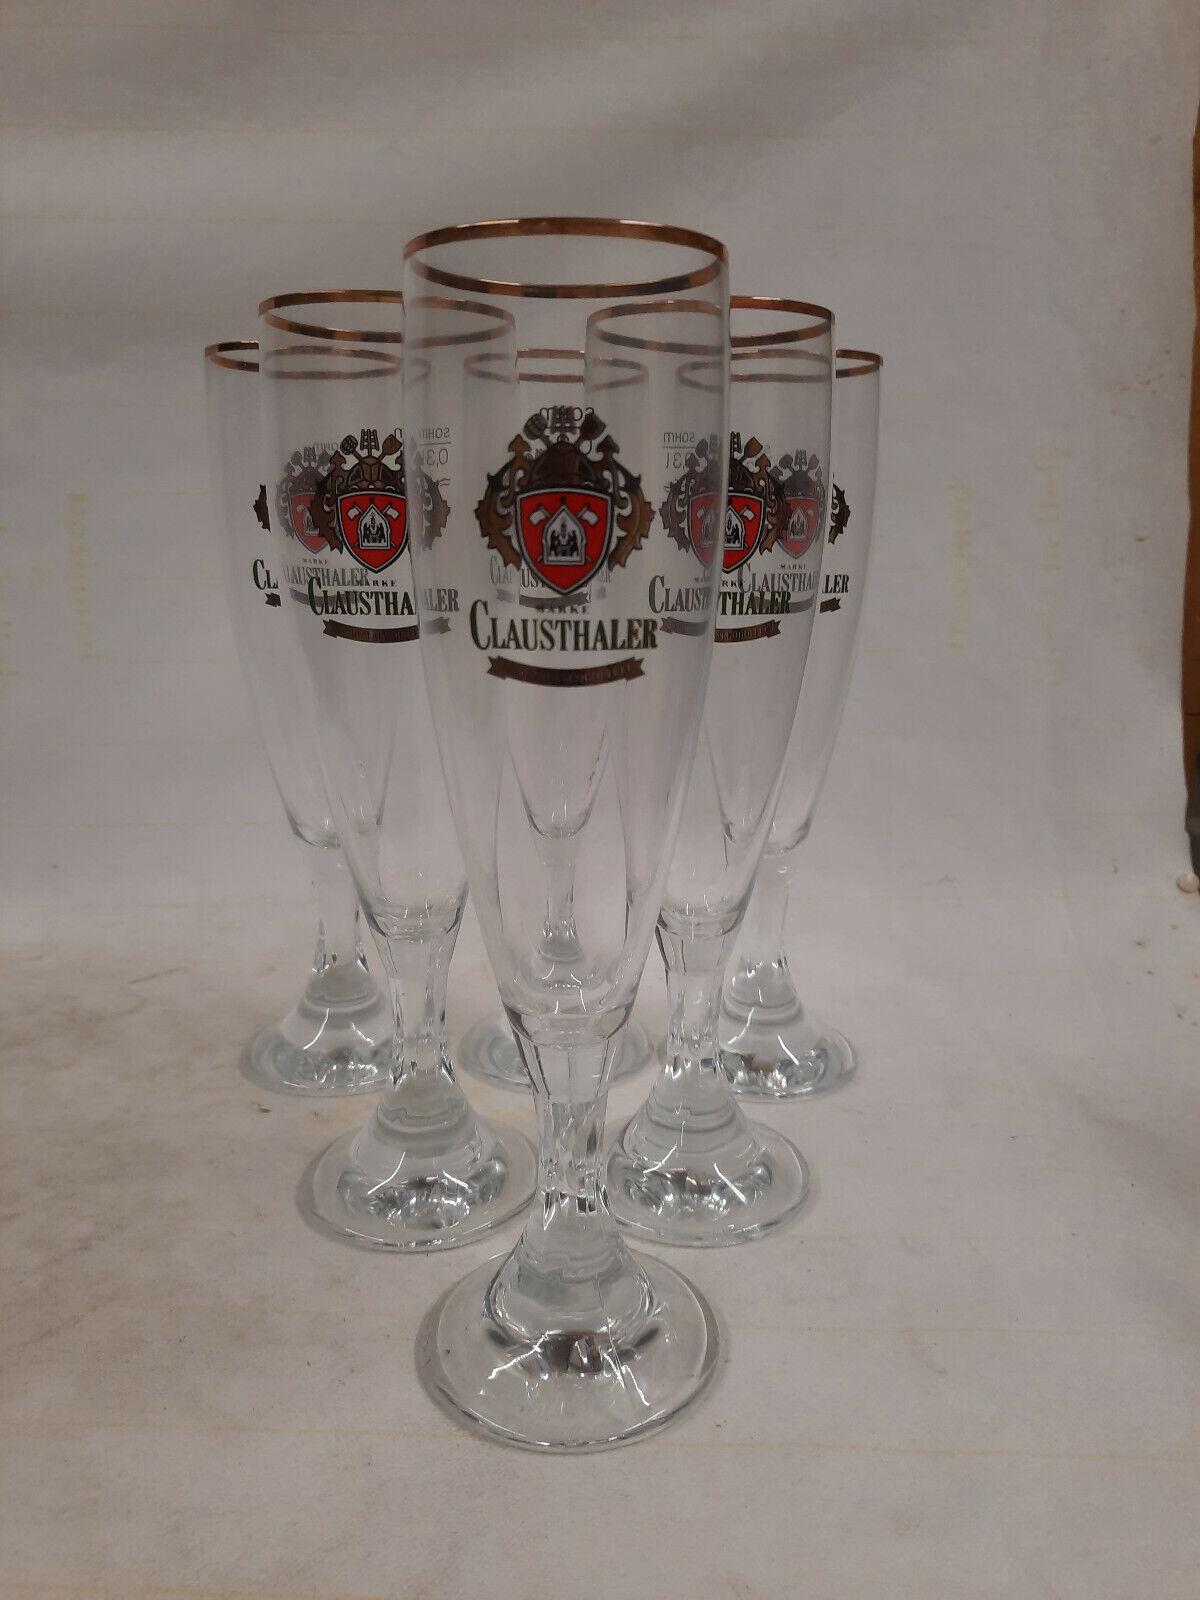 Clausthaler Alkoholfrei 6x Bierglas 0,3 l Gastro Tulpe Pokal